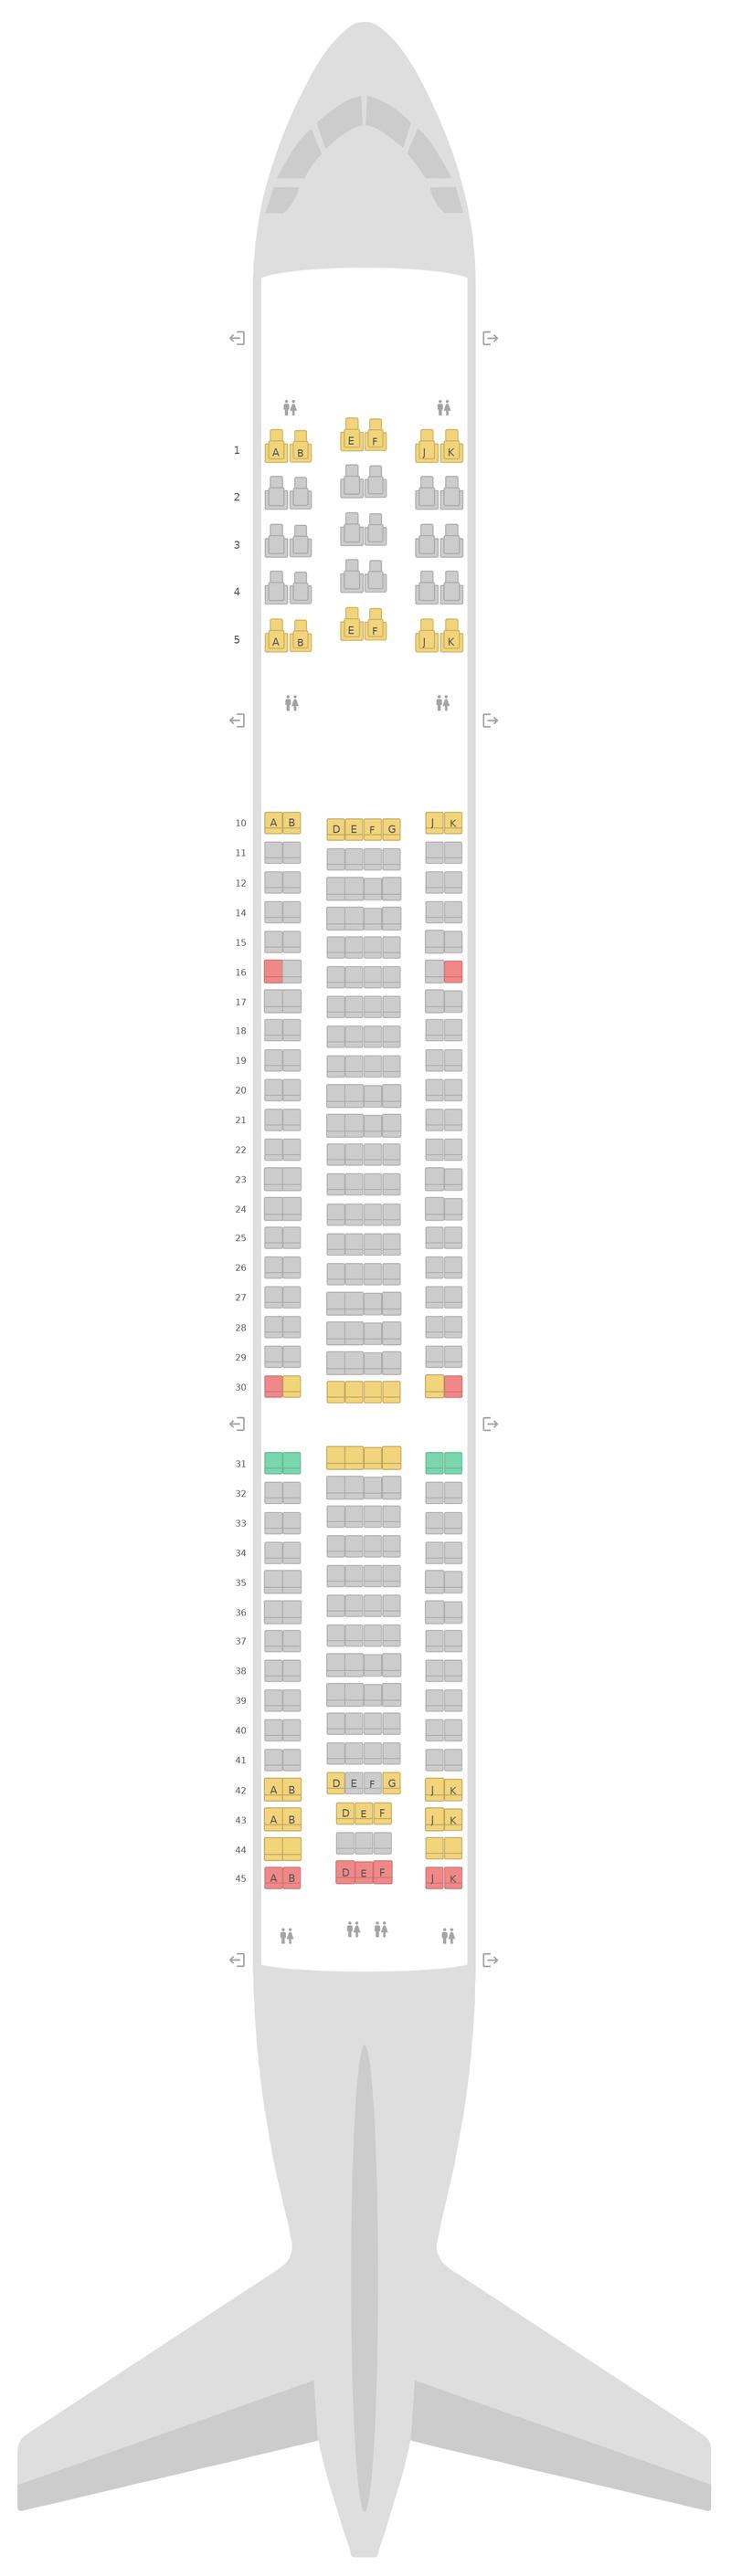 Mapa de asientos Airbus A330-300 (333) v2 Qatar Airways